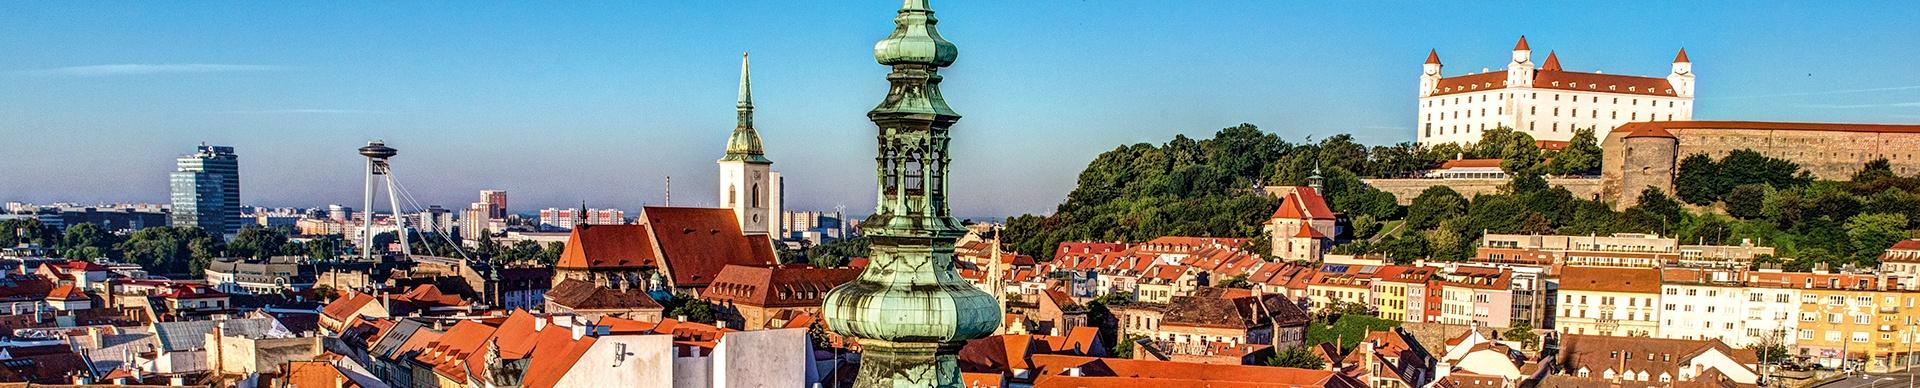 Bratislava Coronation Tour